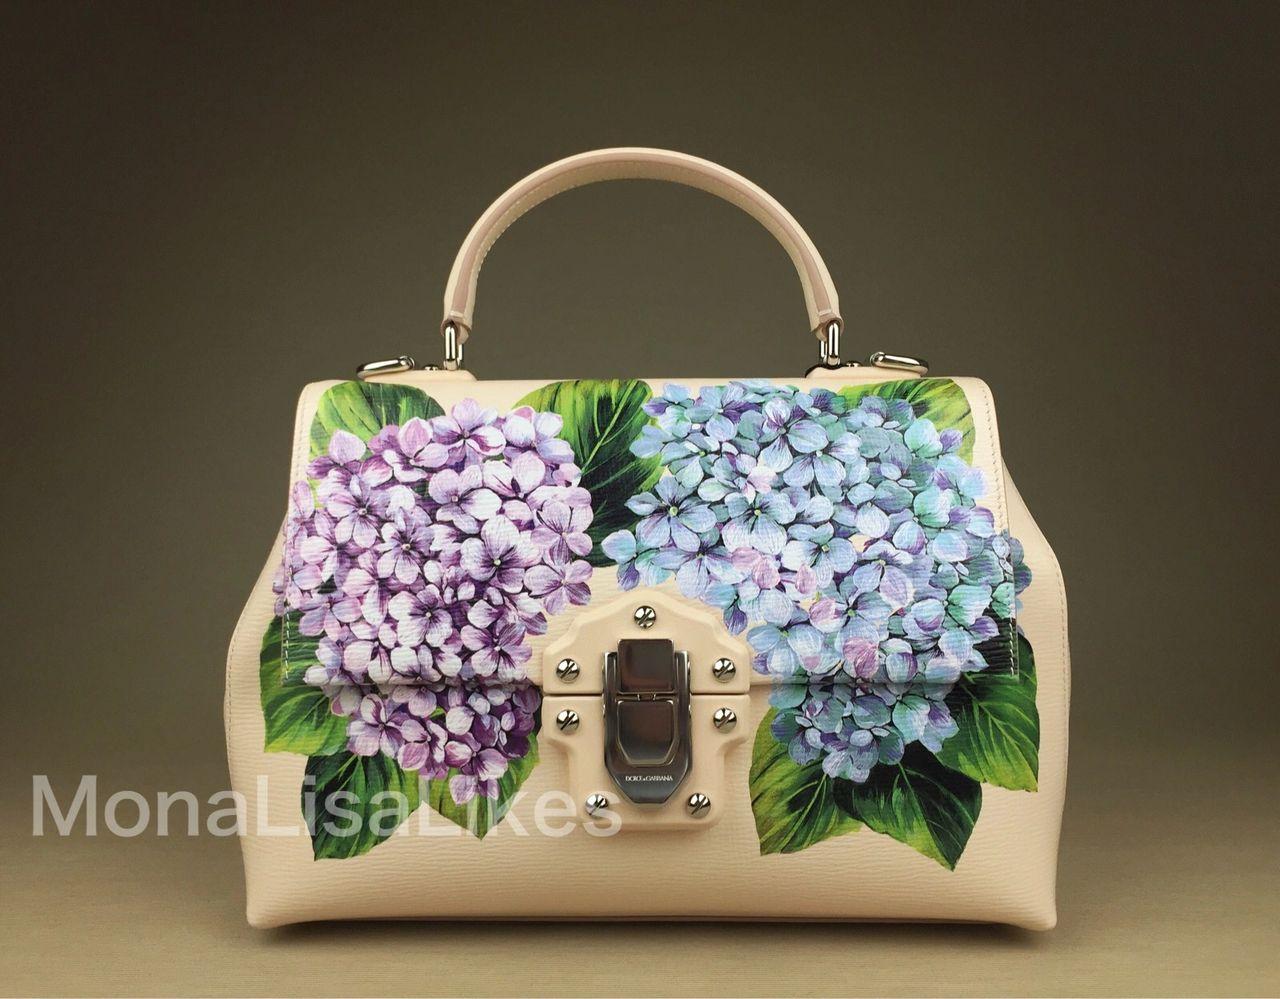 4cc3393afe DOLCE   GABBANA Lucia handbag with Hydrangea print